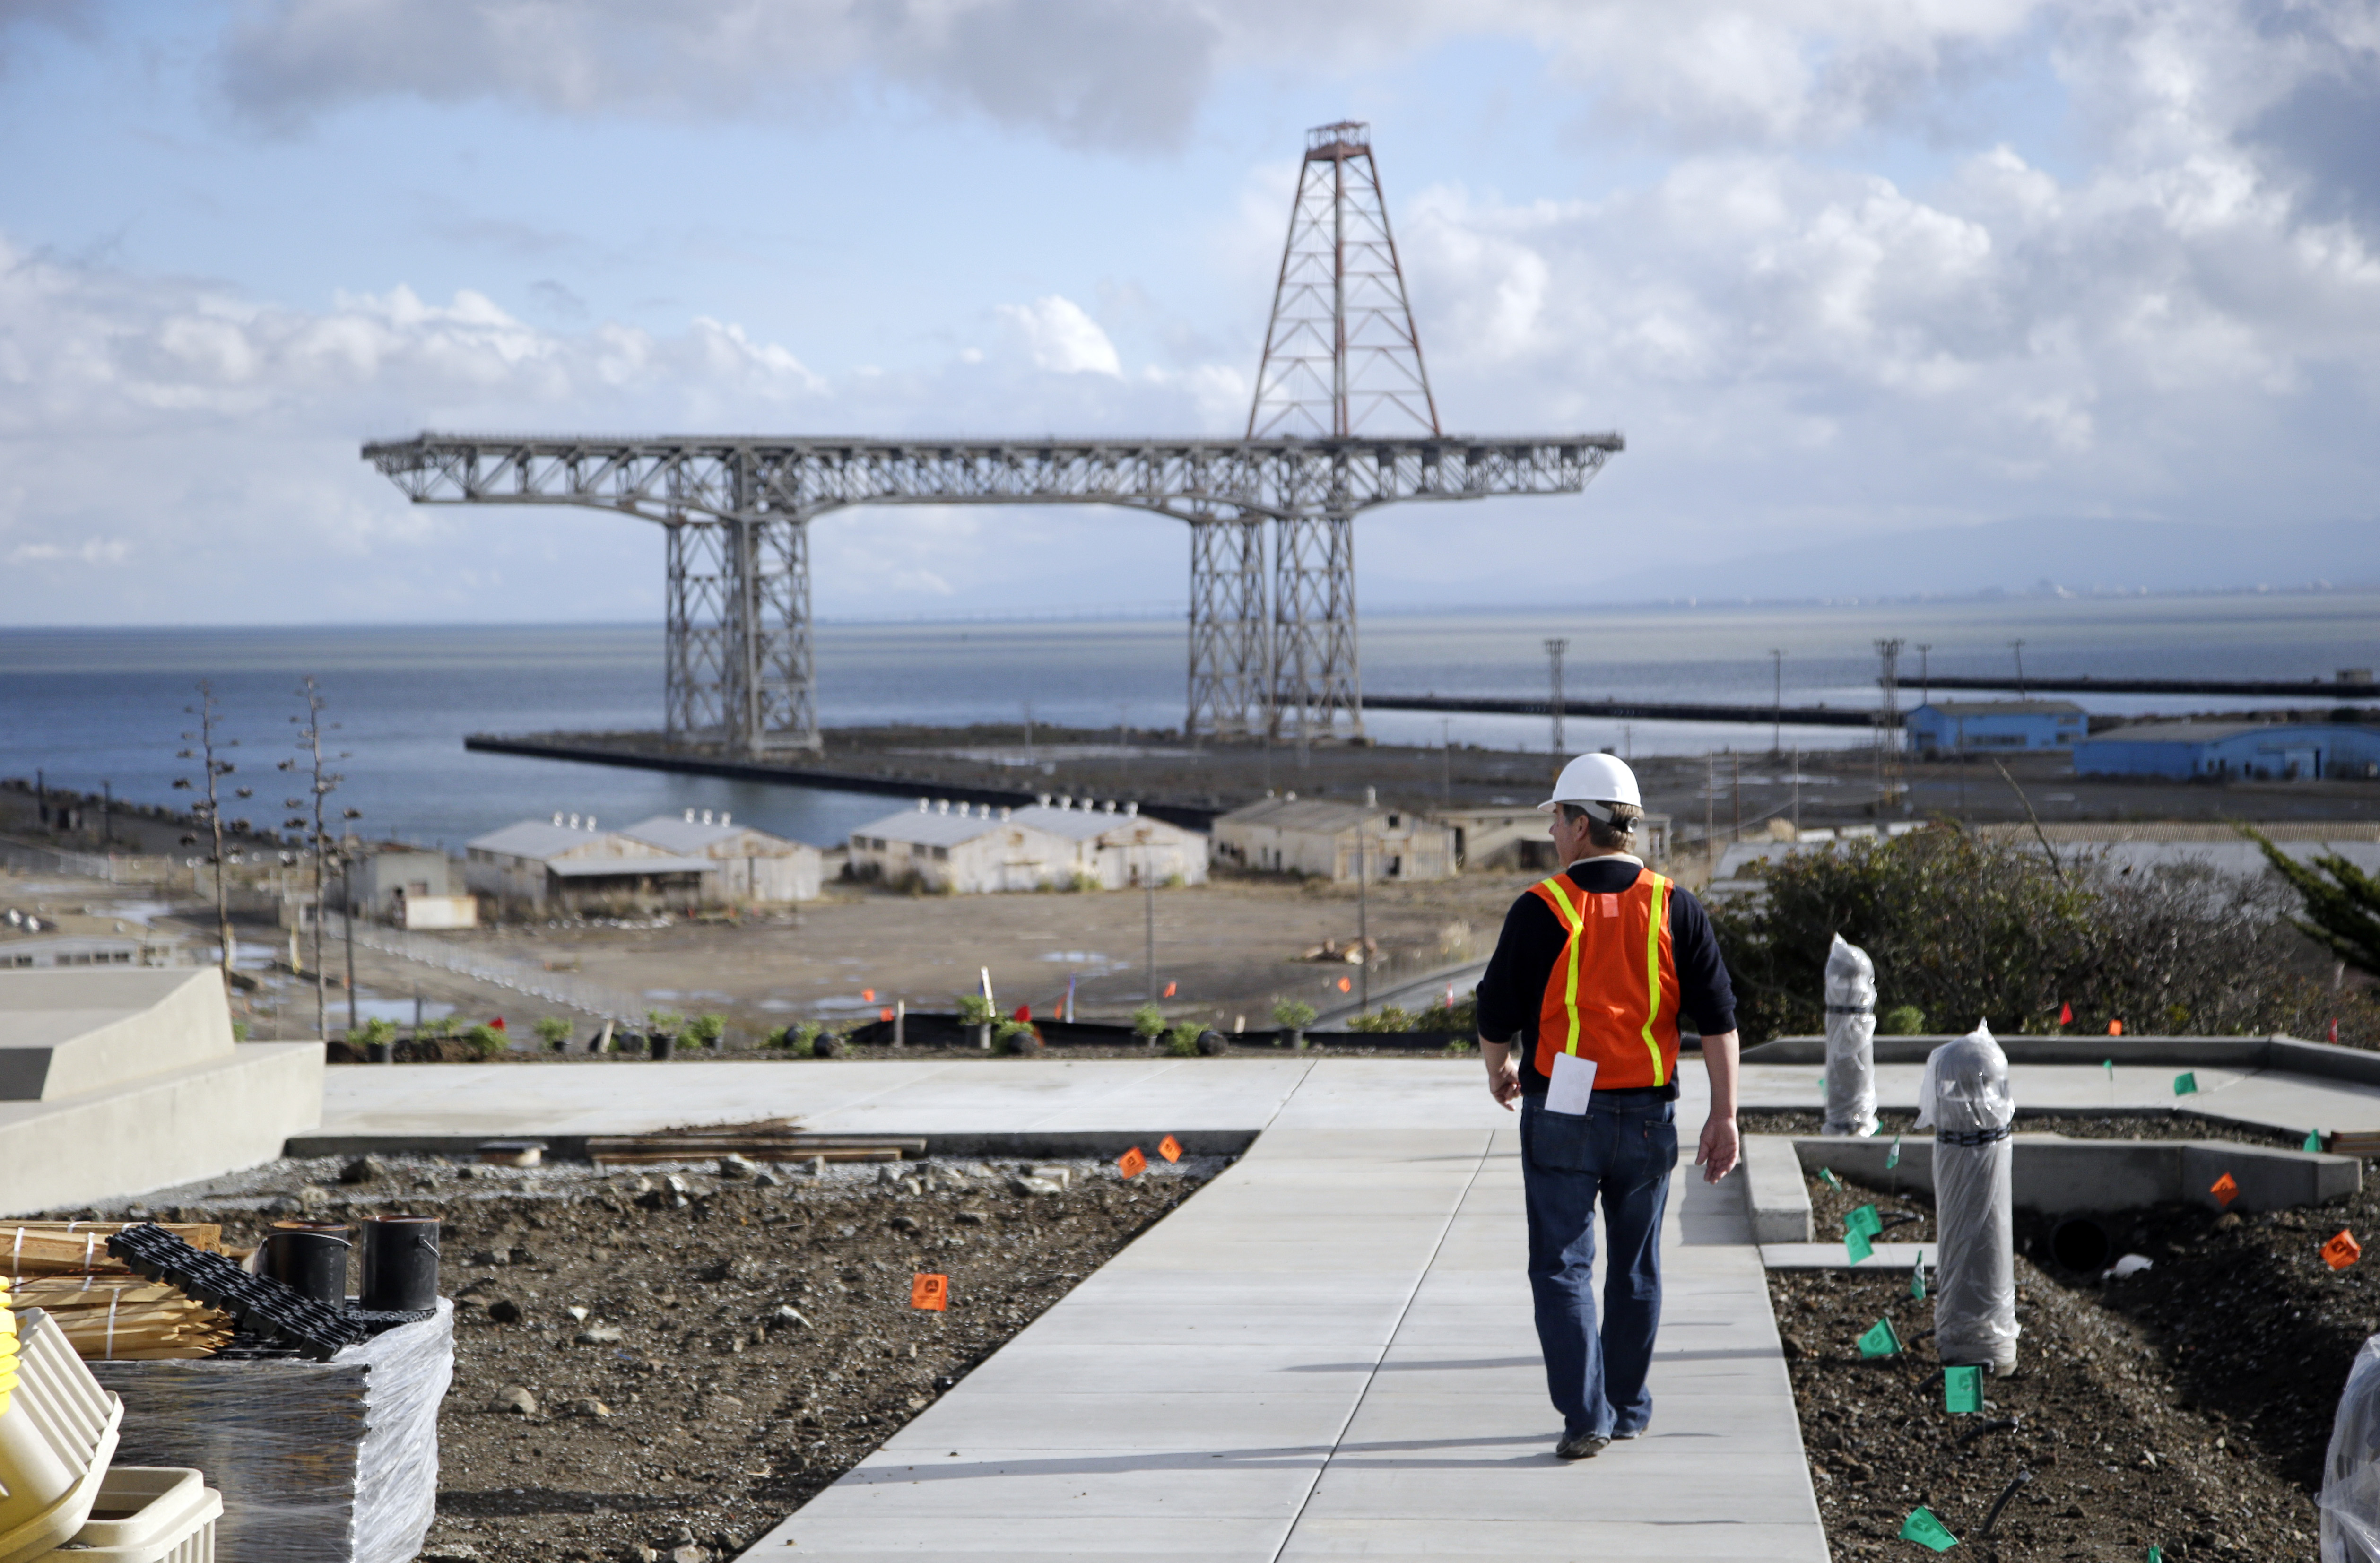 David Satterfield, spokesman for lead developer Lennar Urban, walks the grounds of the new San Francisco Shipyard homes development in Hunters Point, 2015.